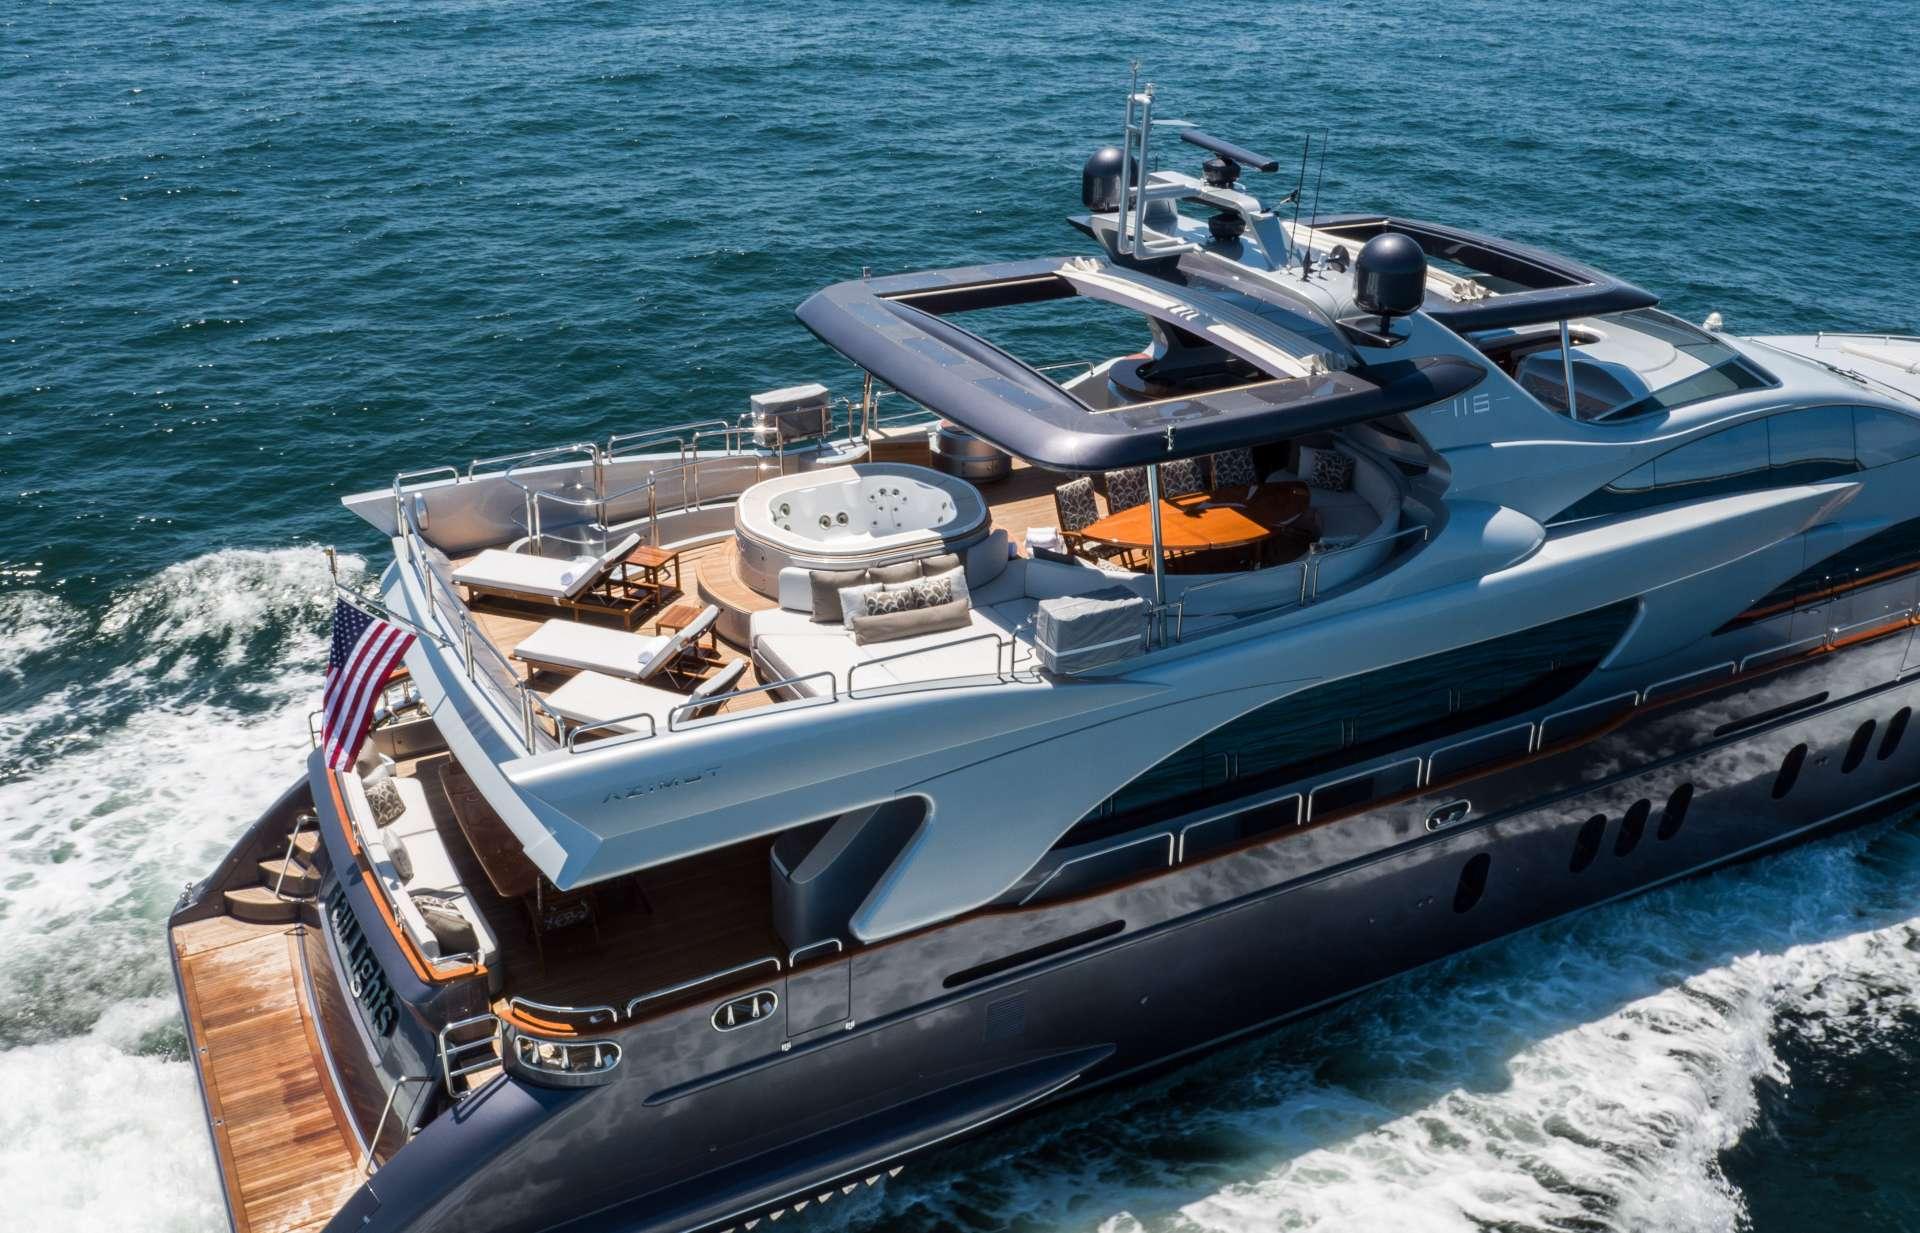 Motor Yacht 'TAIL LIGHTS', 12 PAX, 6 Crew, 116.00 Ft, 35.00 Meters, Built 2011, Azimut, Refit Year 2016